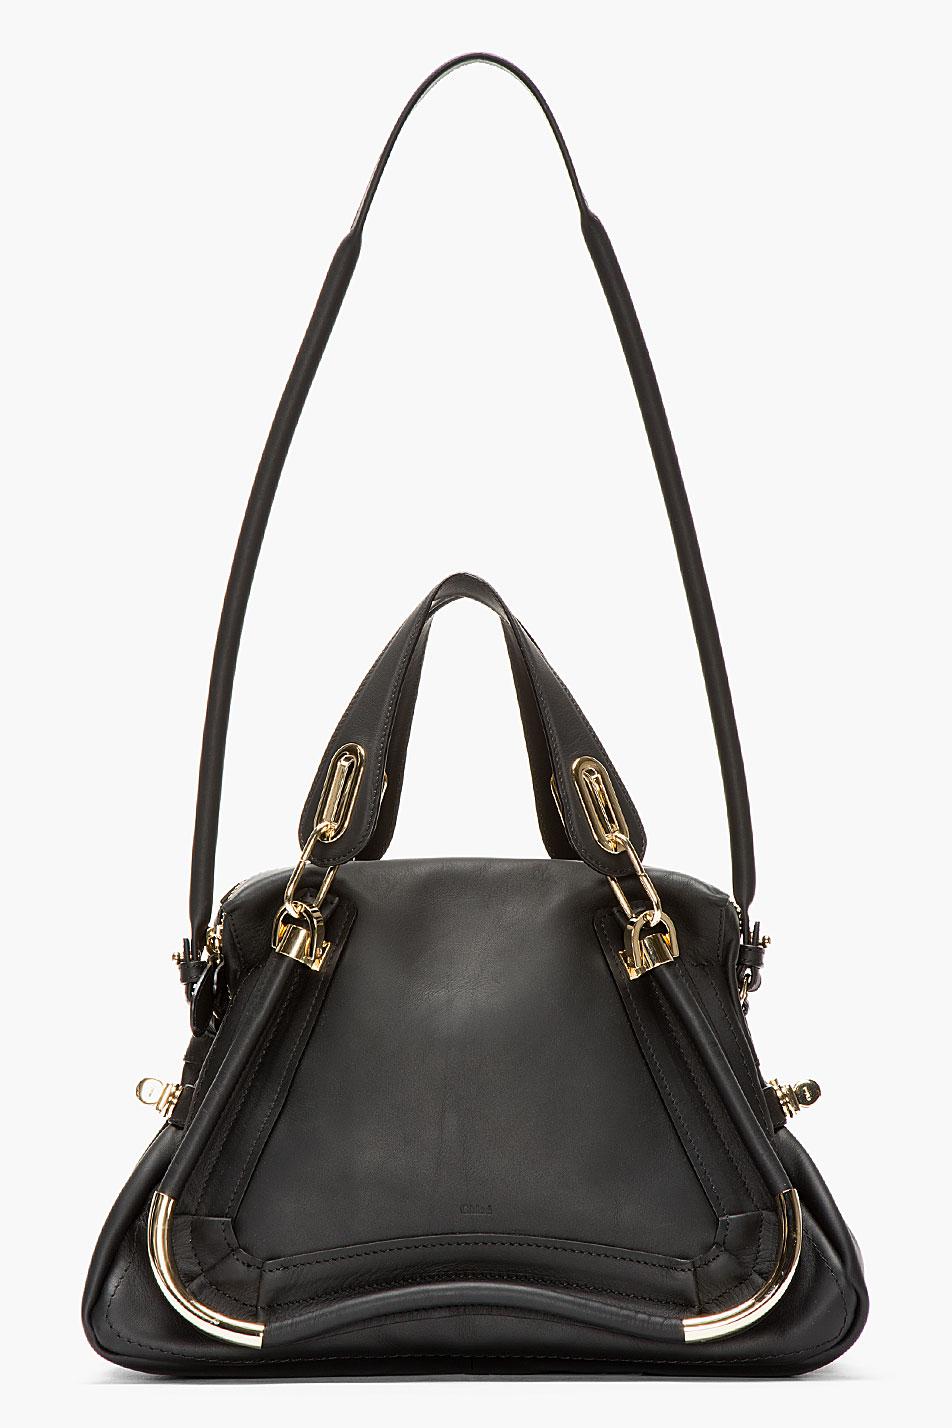 Chlo¨¦ Black Leather Medium Paraty Shoulder Bag in Black | Lyst